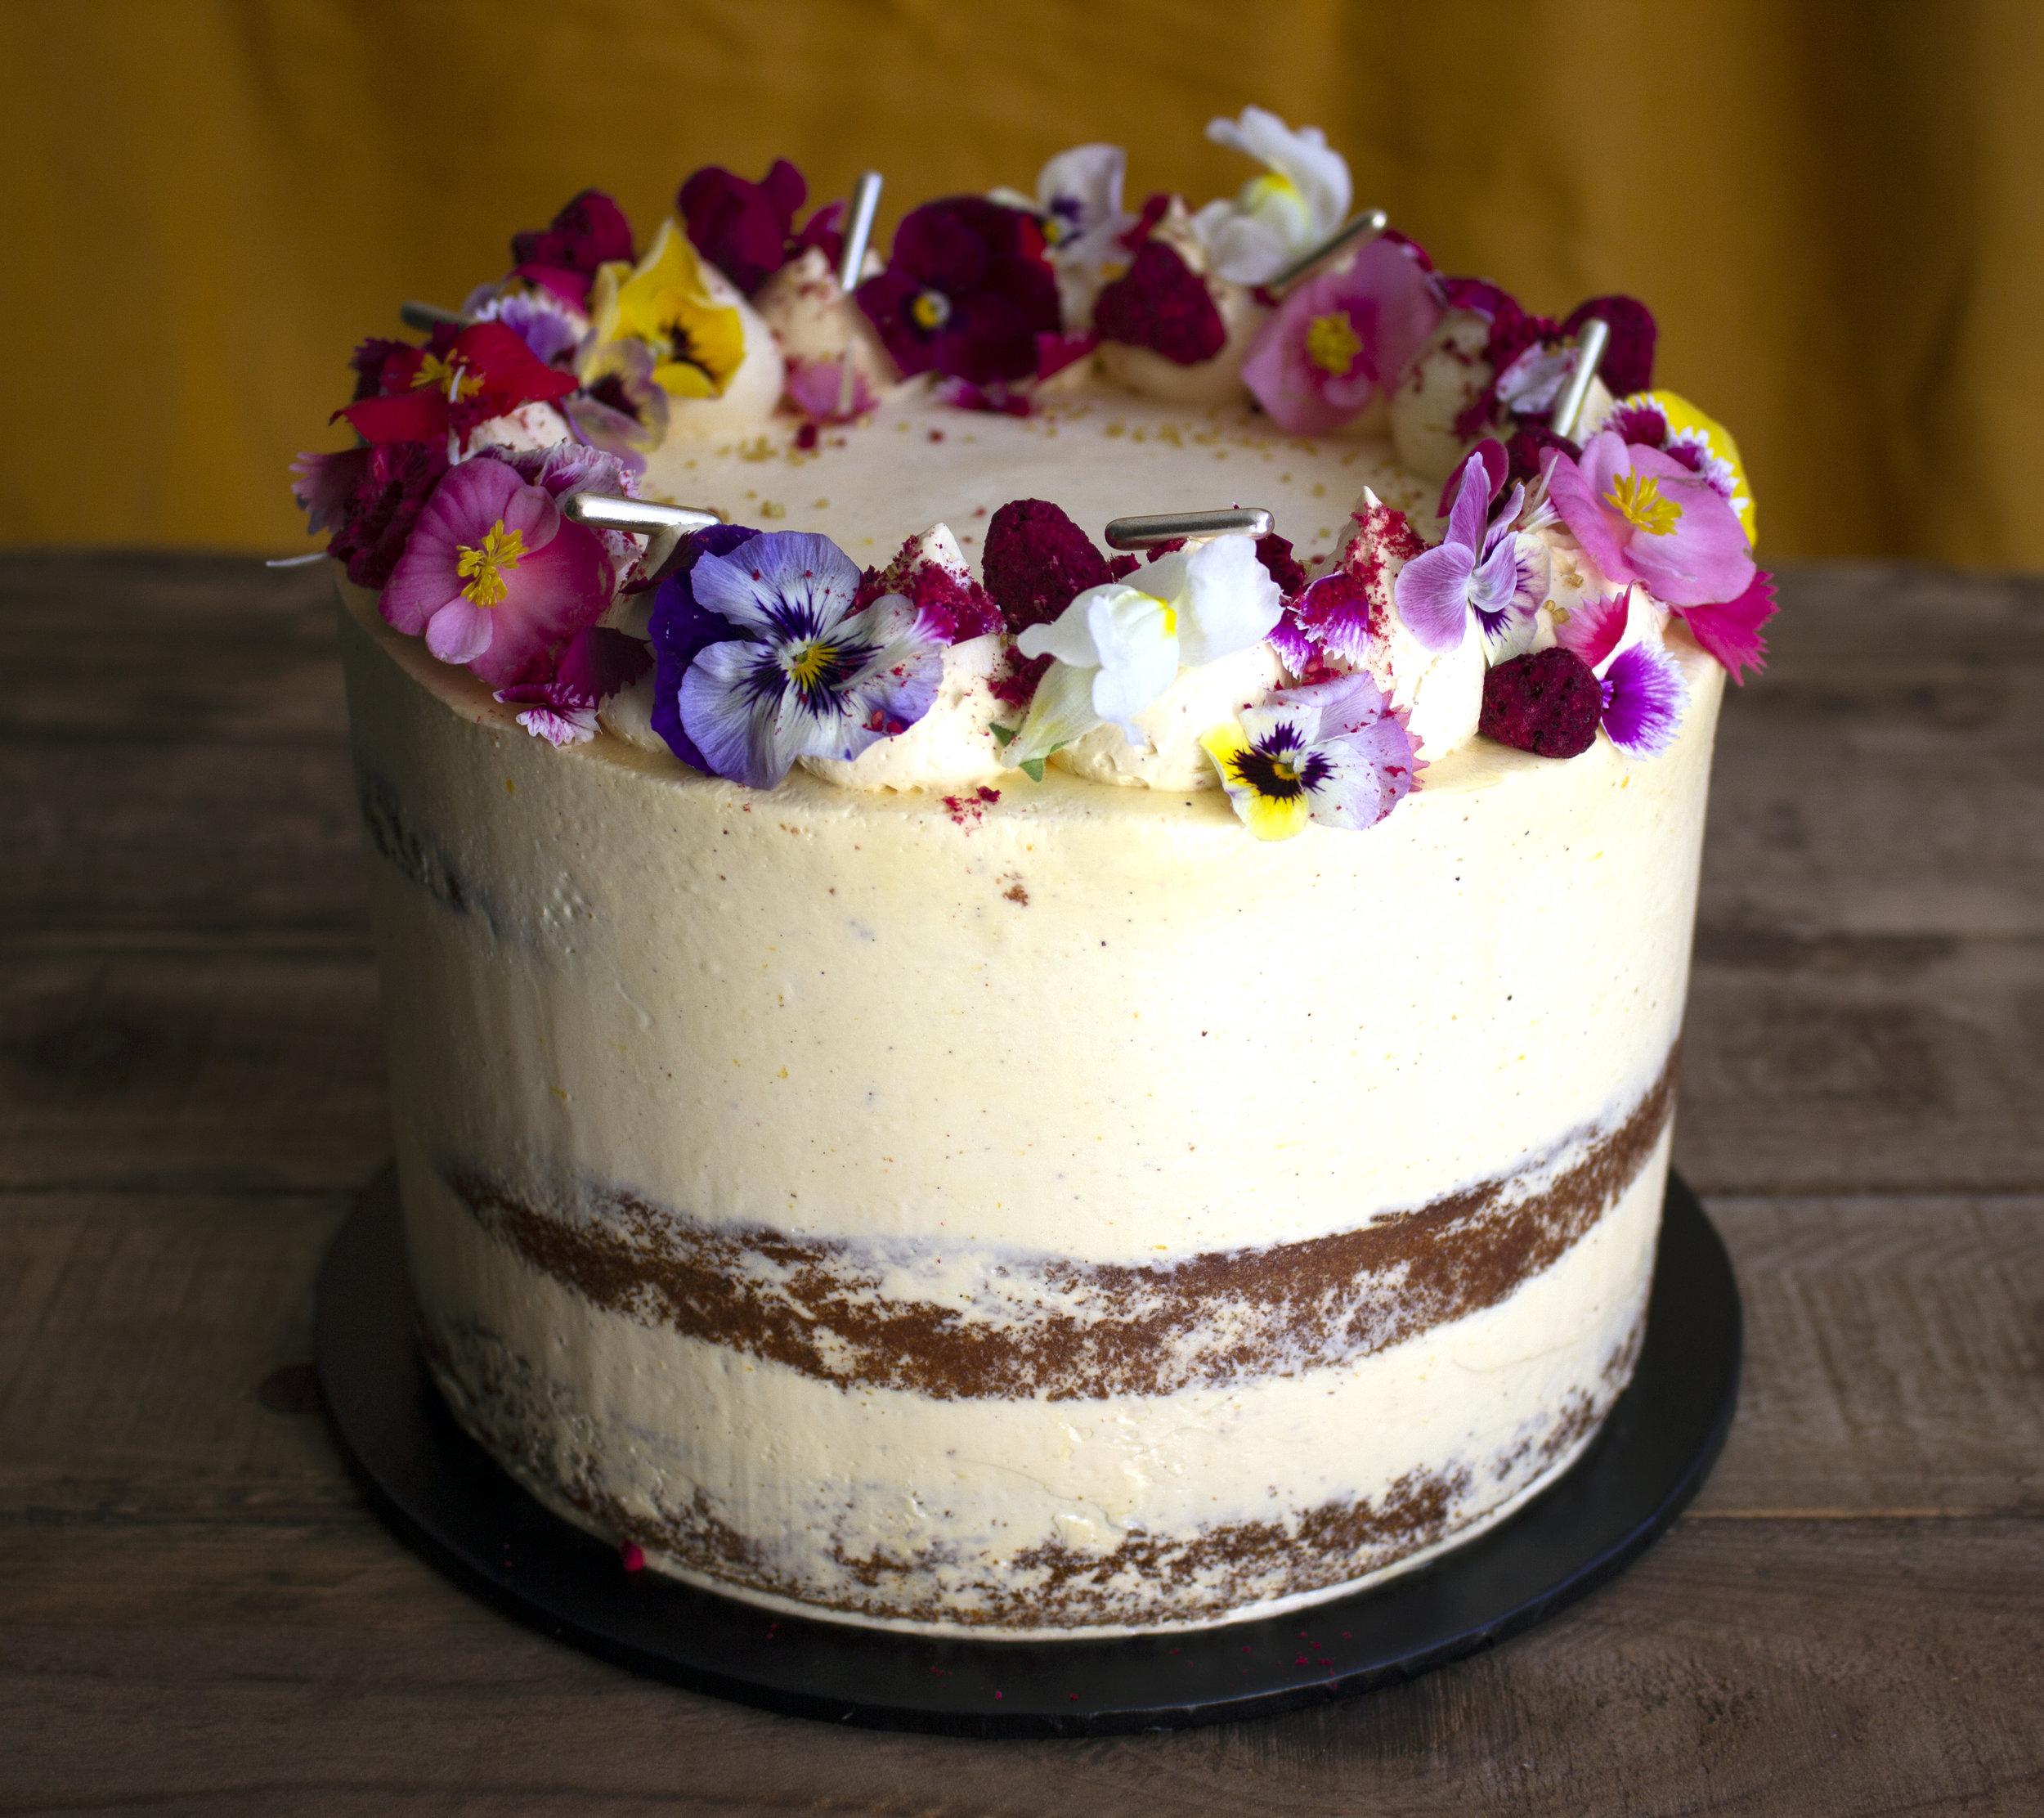 cake176.jpg